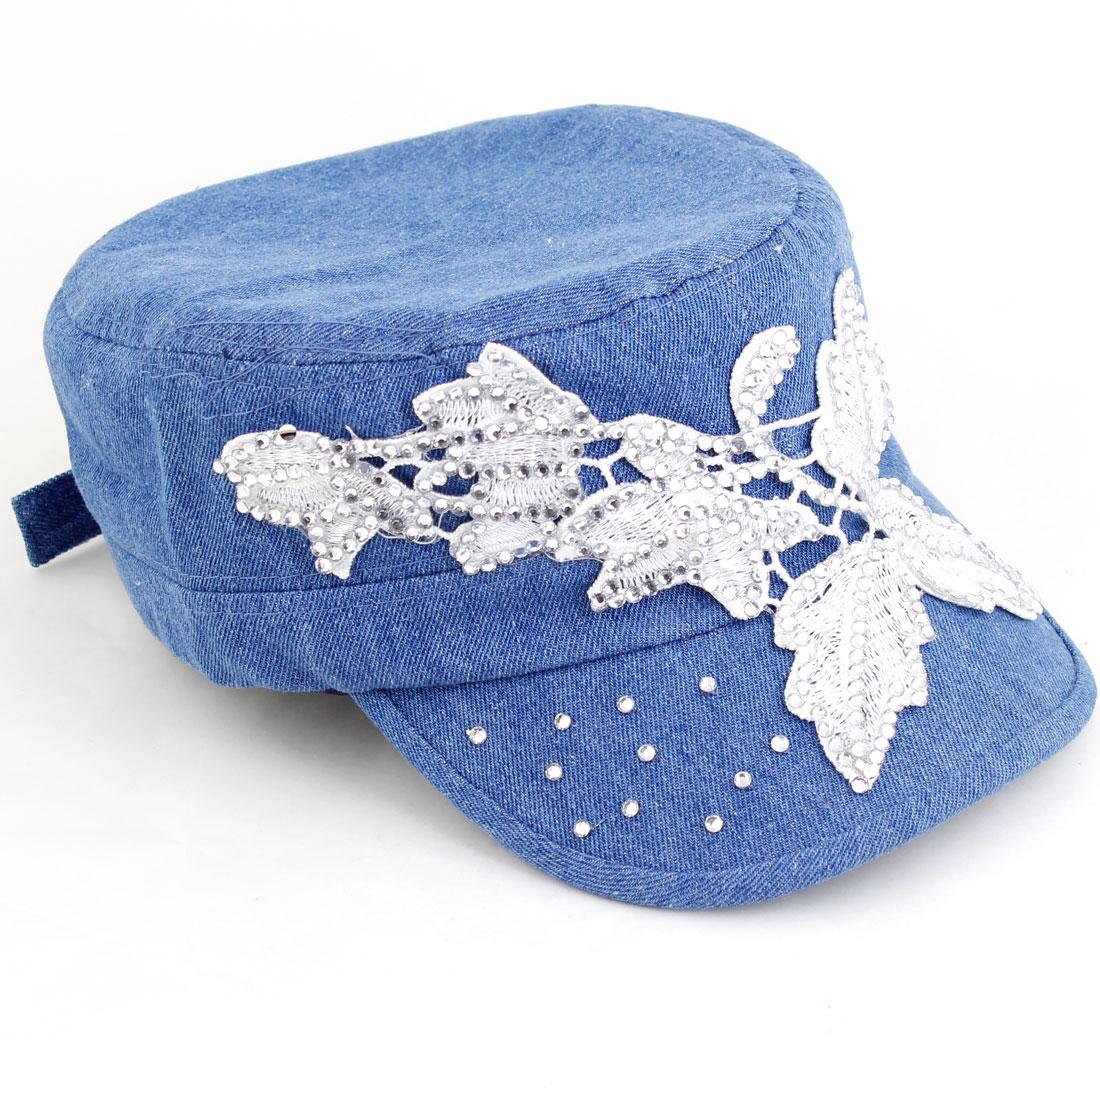 Lady Blue White Bling Bling Rhinestone Decor Adjustable Buckle Visor Cap